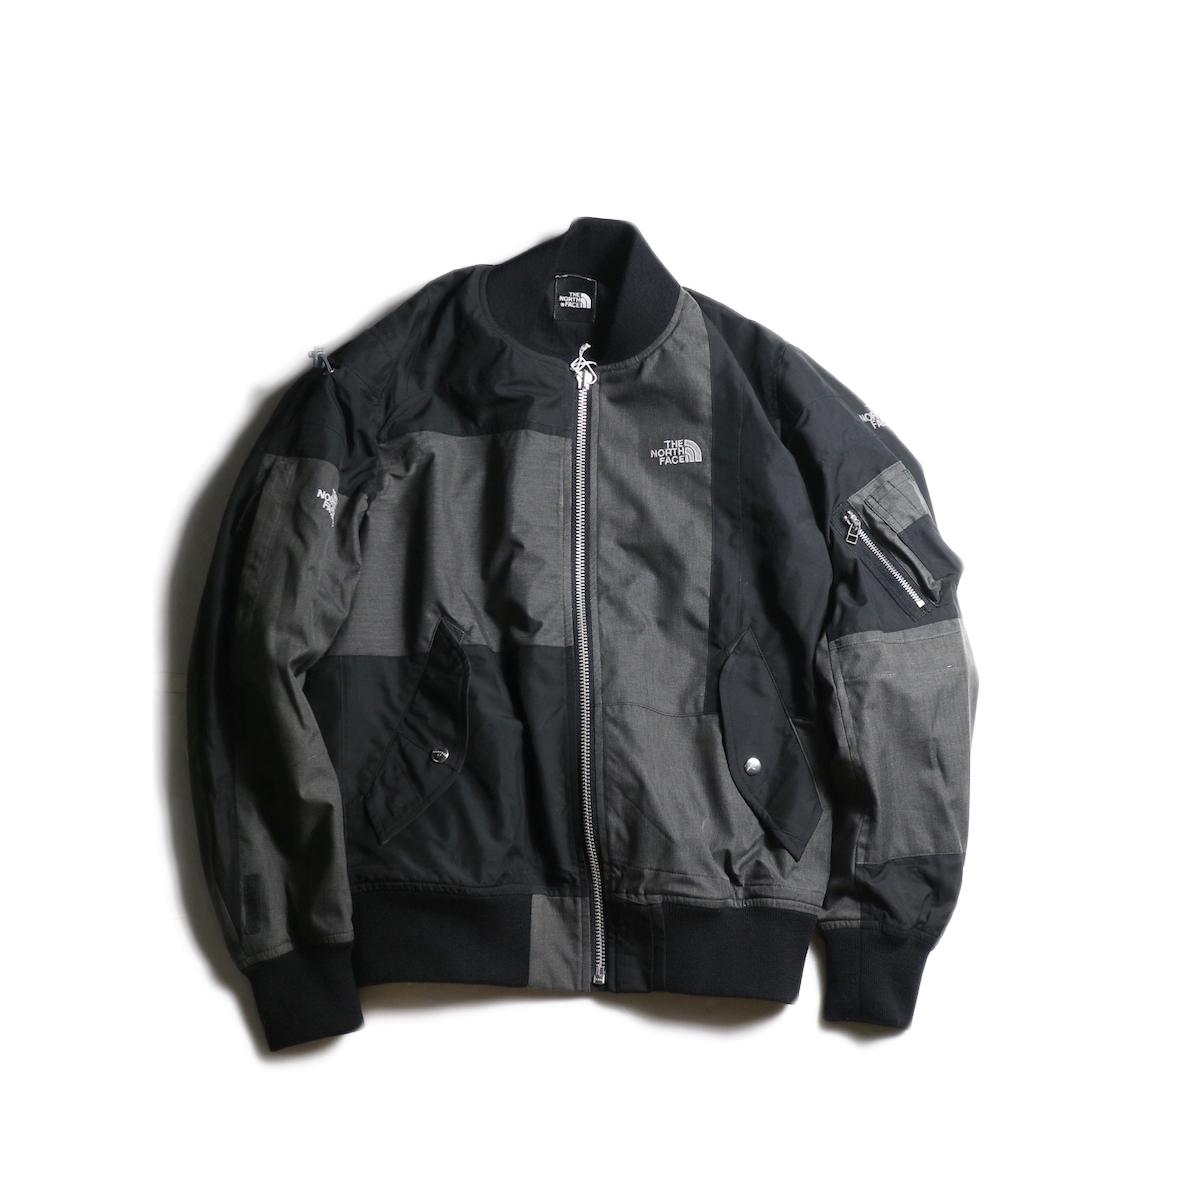 OLD PARK / Flight Jacket (OUTDOOR)